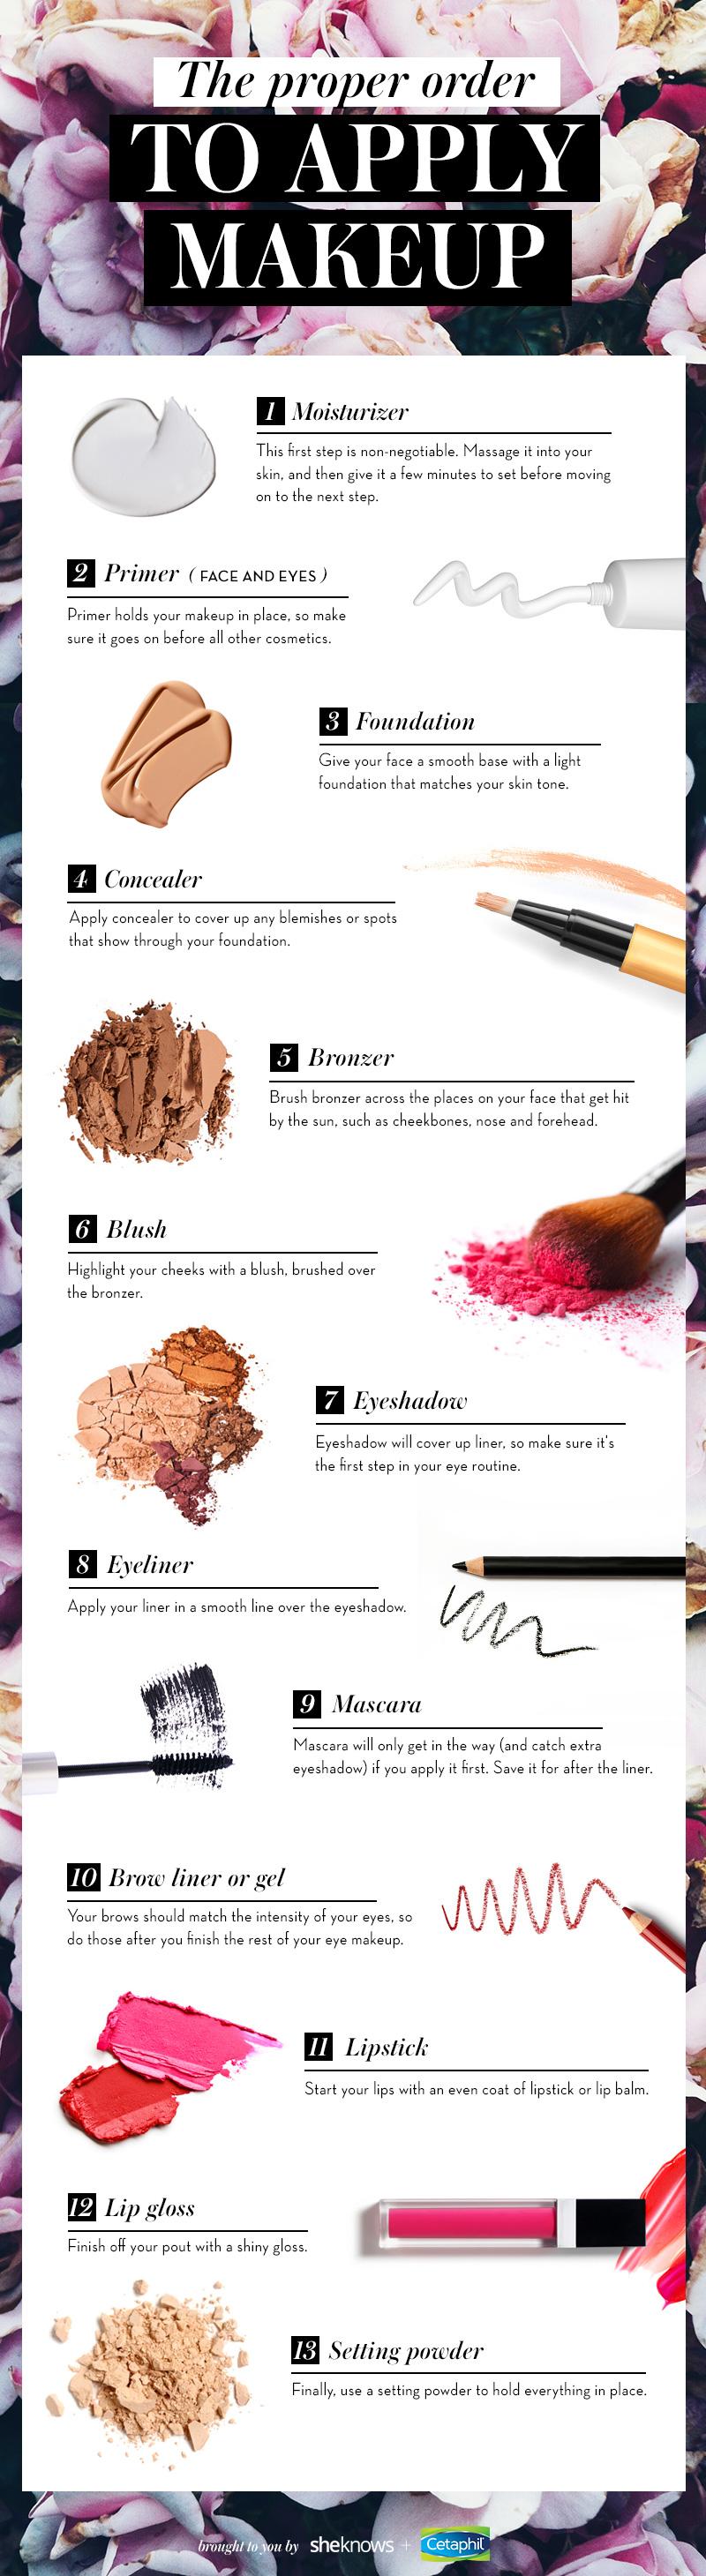 Correct Makeup Application Order